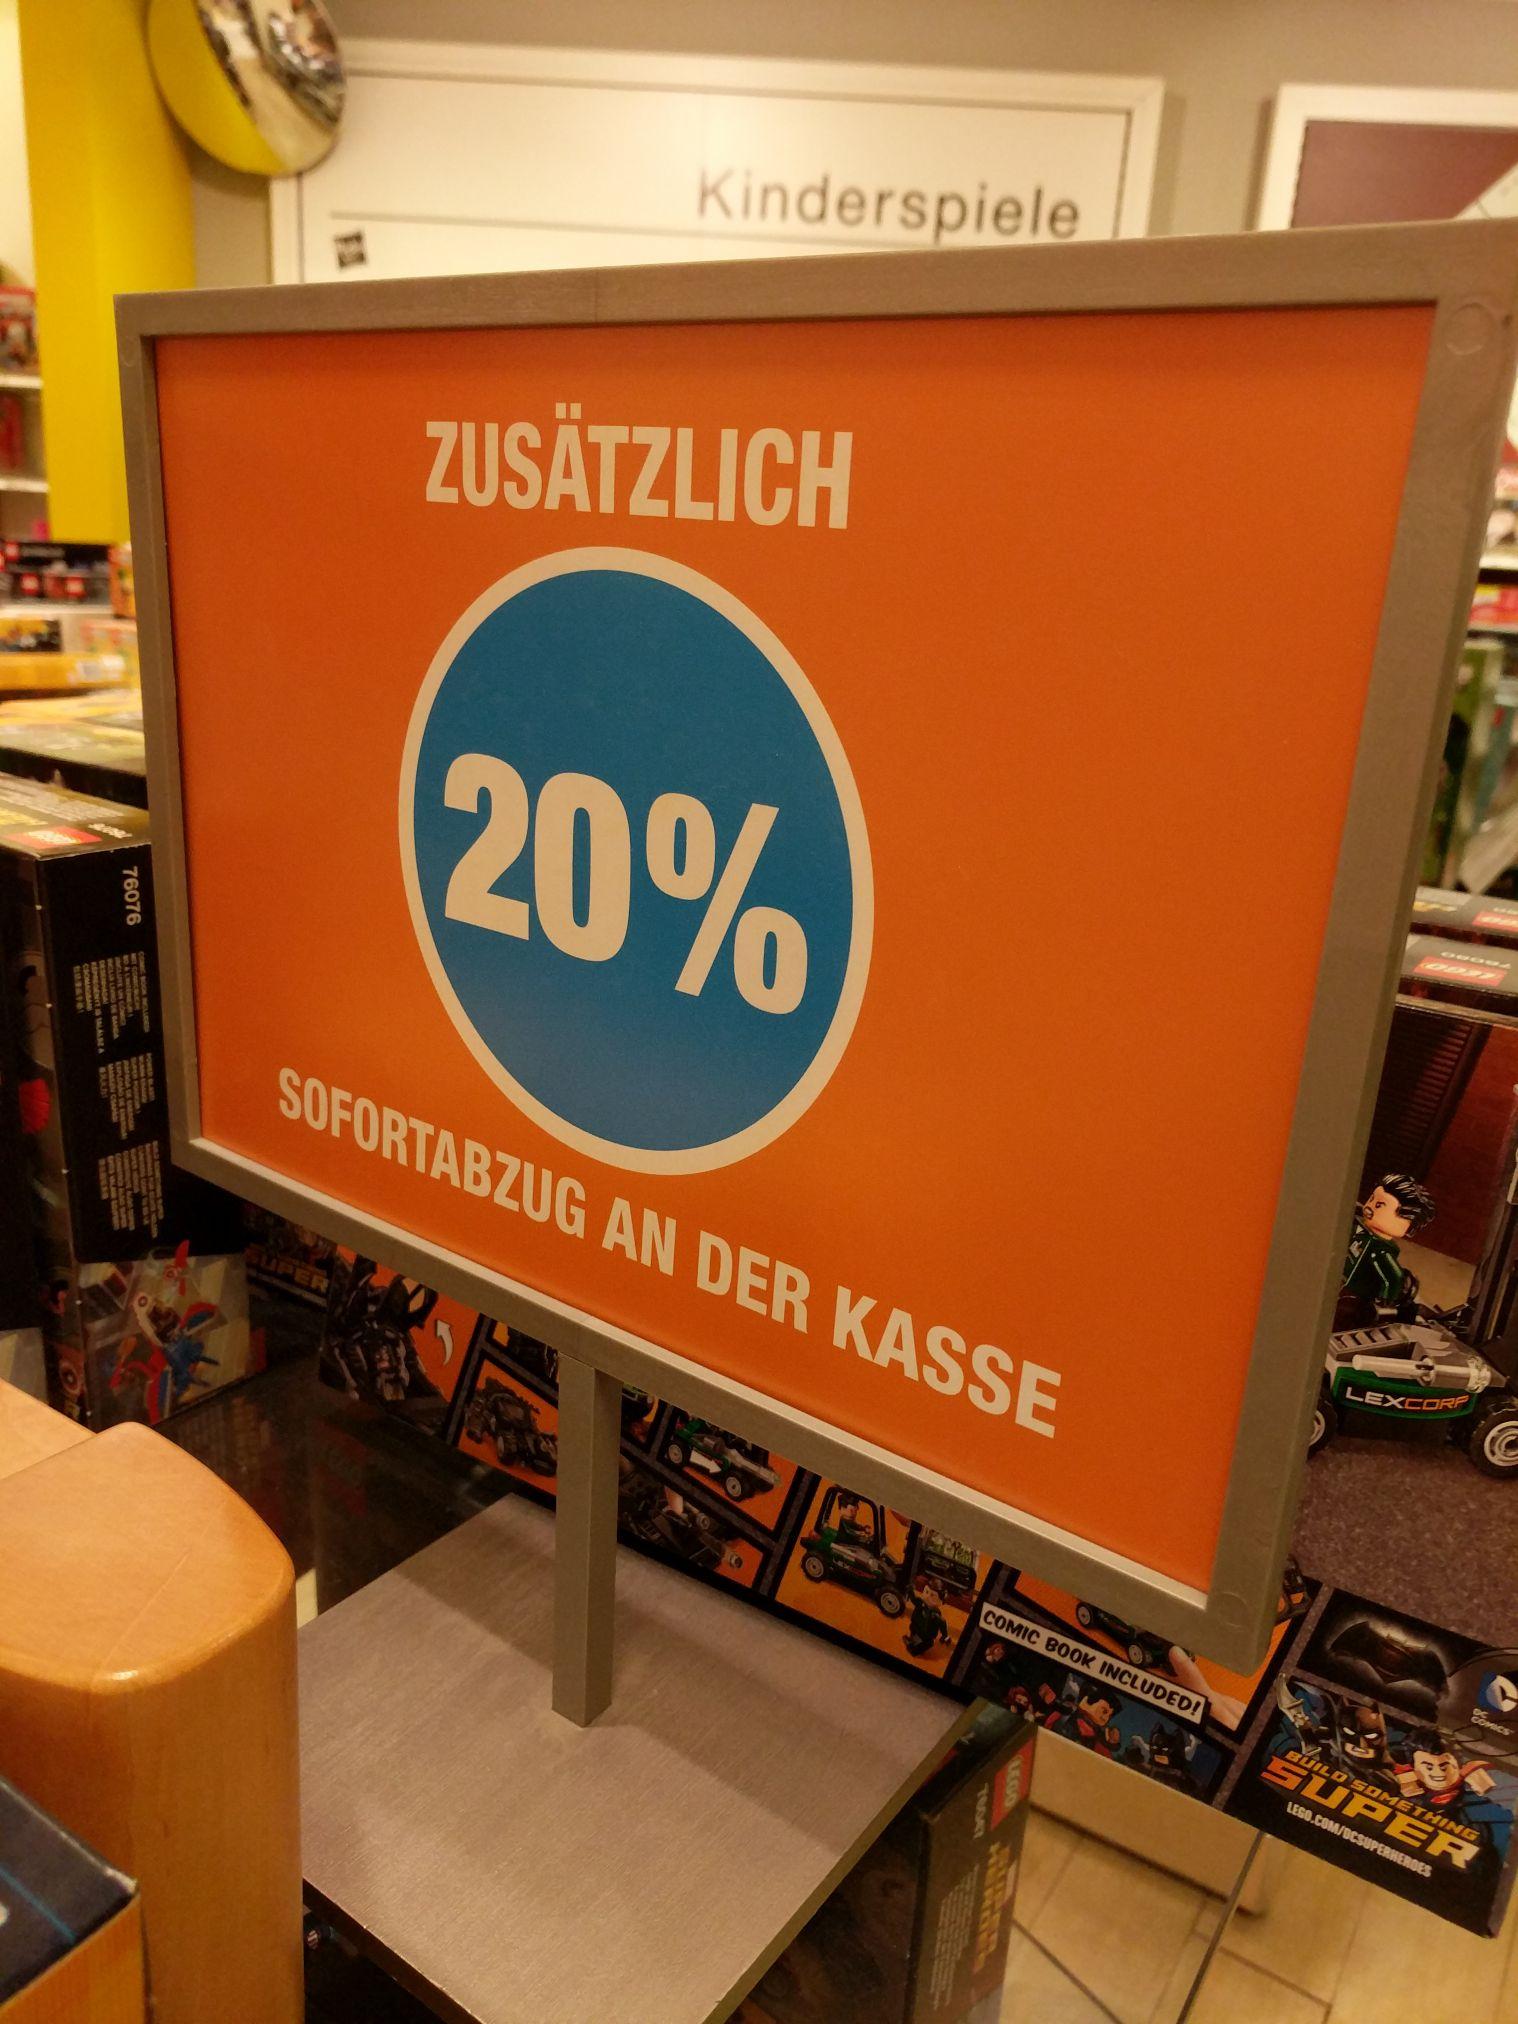 20% Auf alles Galeria Kaufhof Lokal Berlin Gropius Passagen